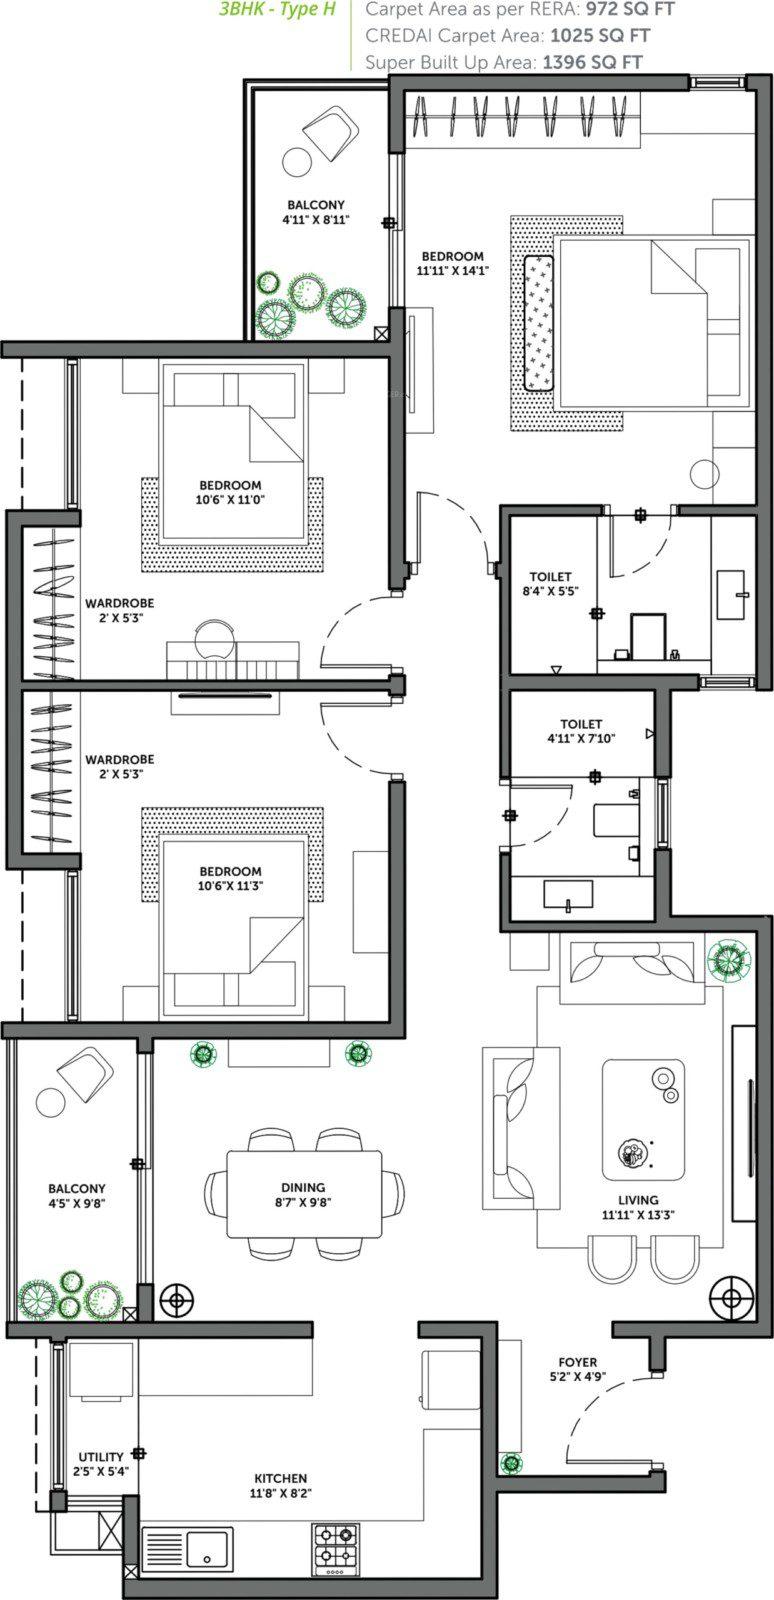 Assetz 63 Degree East - 3 BHK Floor Plan